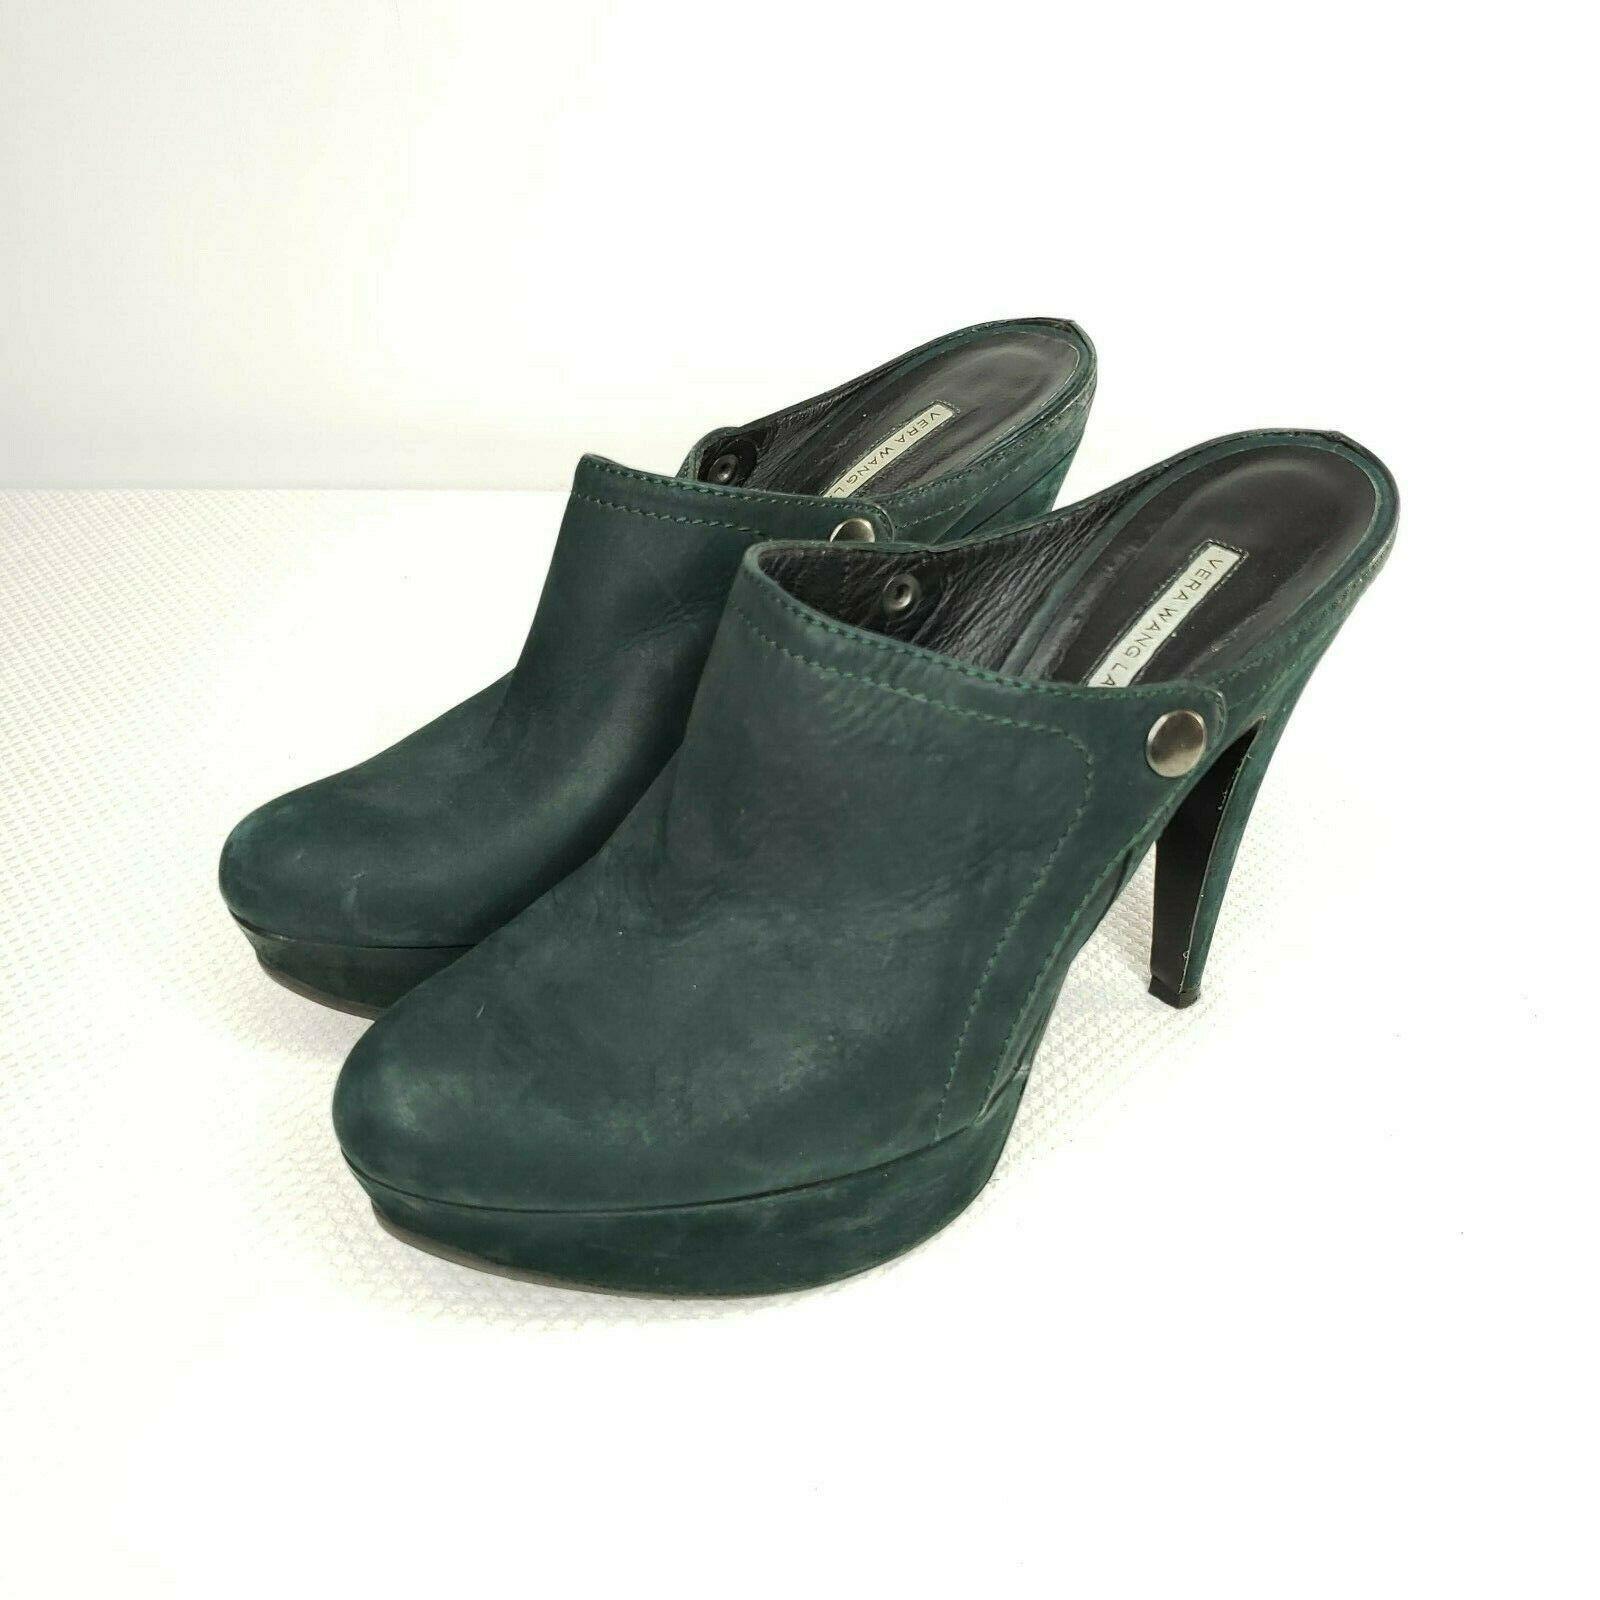 Vera Wang Lavender Collection Platform Dk Green Suede Mules Platform 9.5 Heels - $98.95